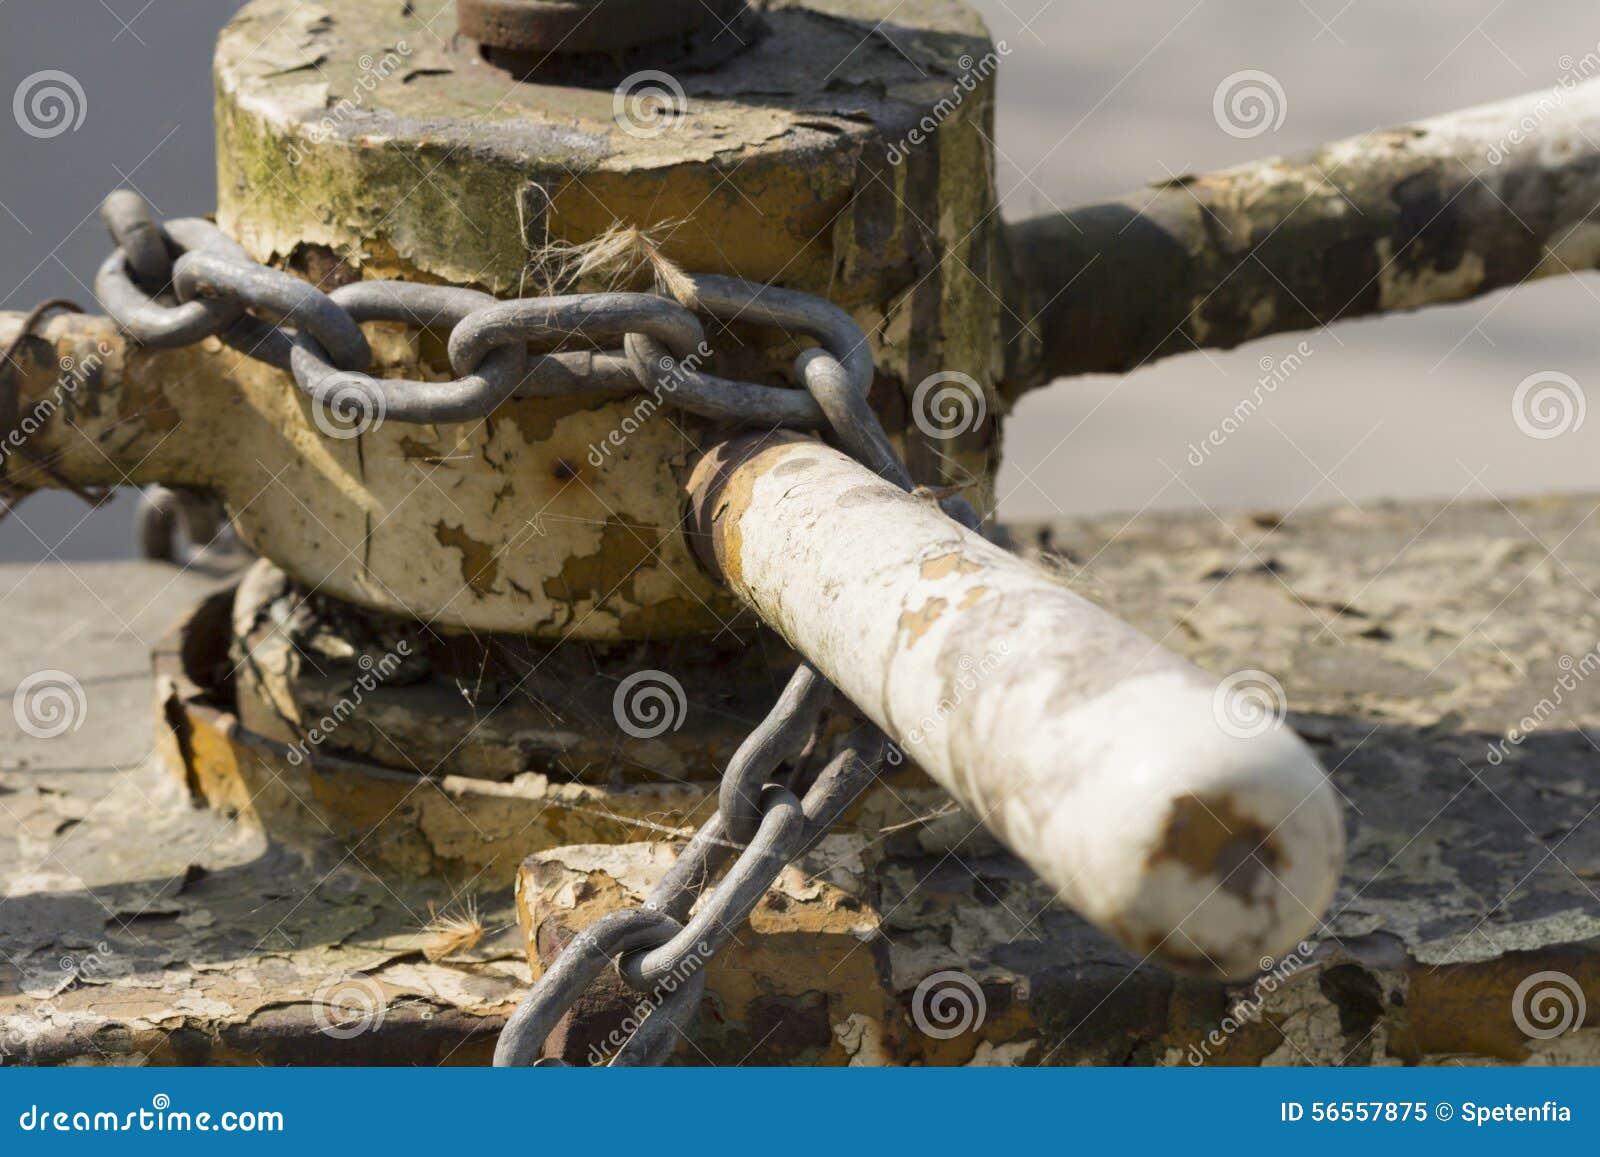 Download Παλαιά σκουριασμένη αλυσίδα Στοκ Εικόνα - εικόνα από αλυσίδα, agedness: 56557875